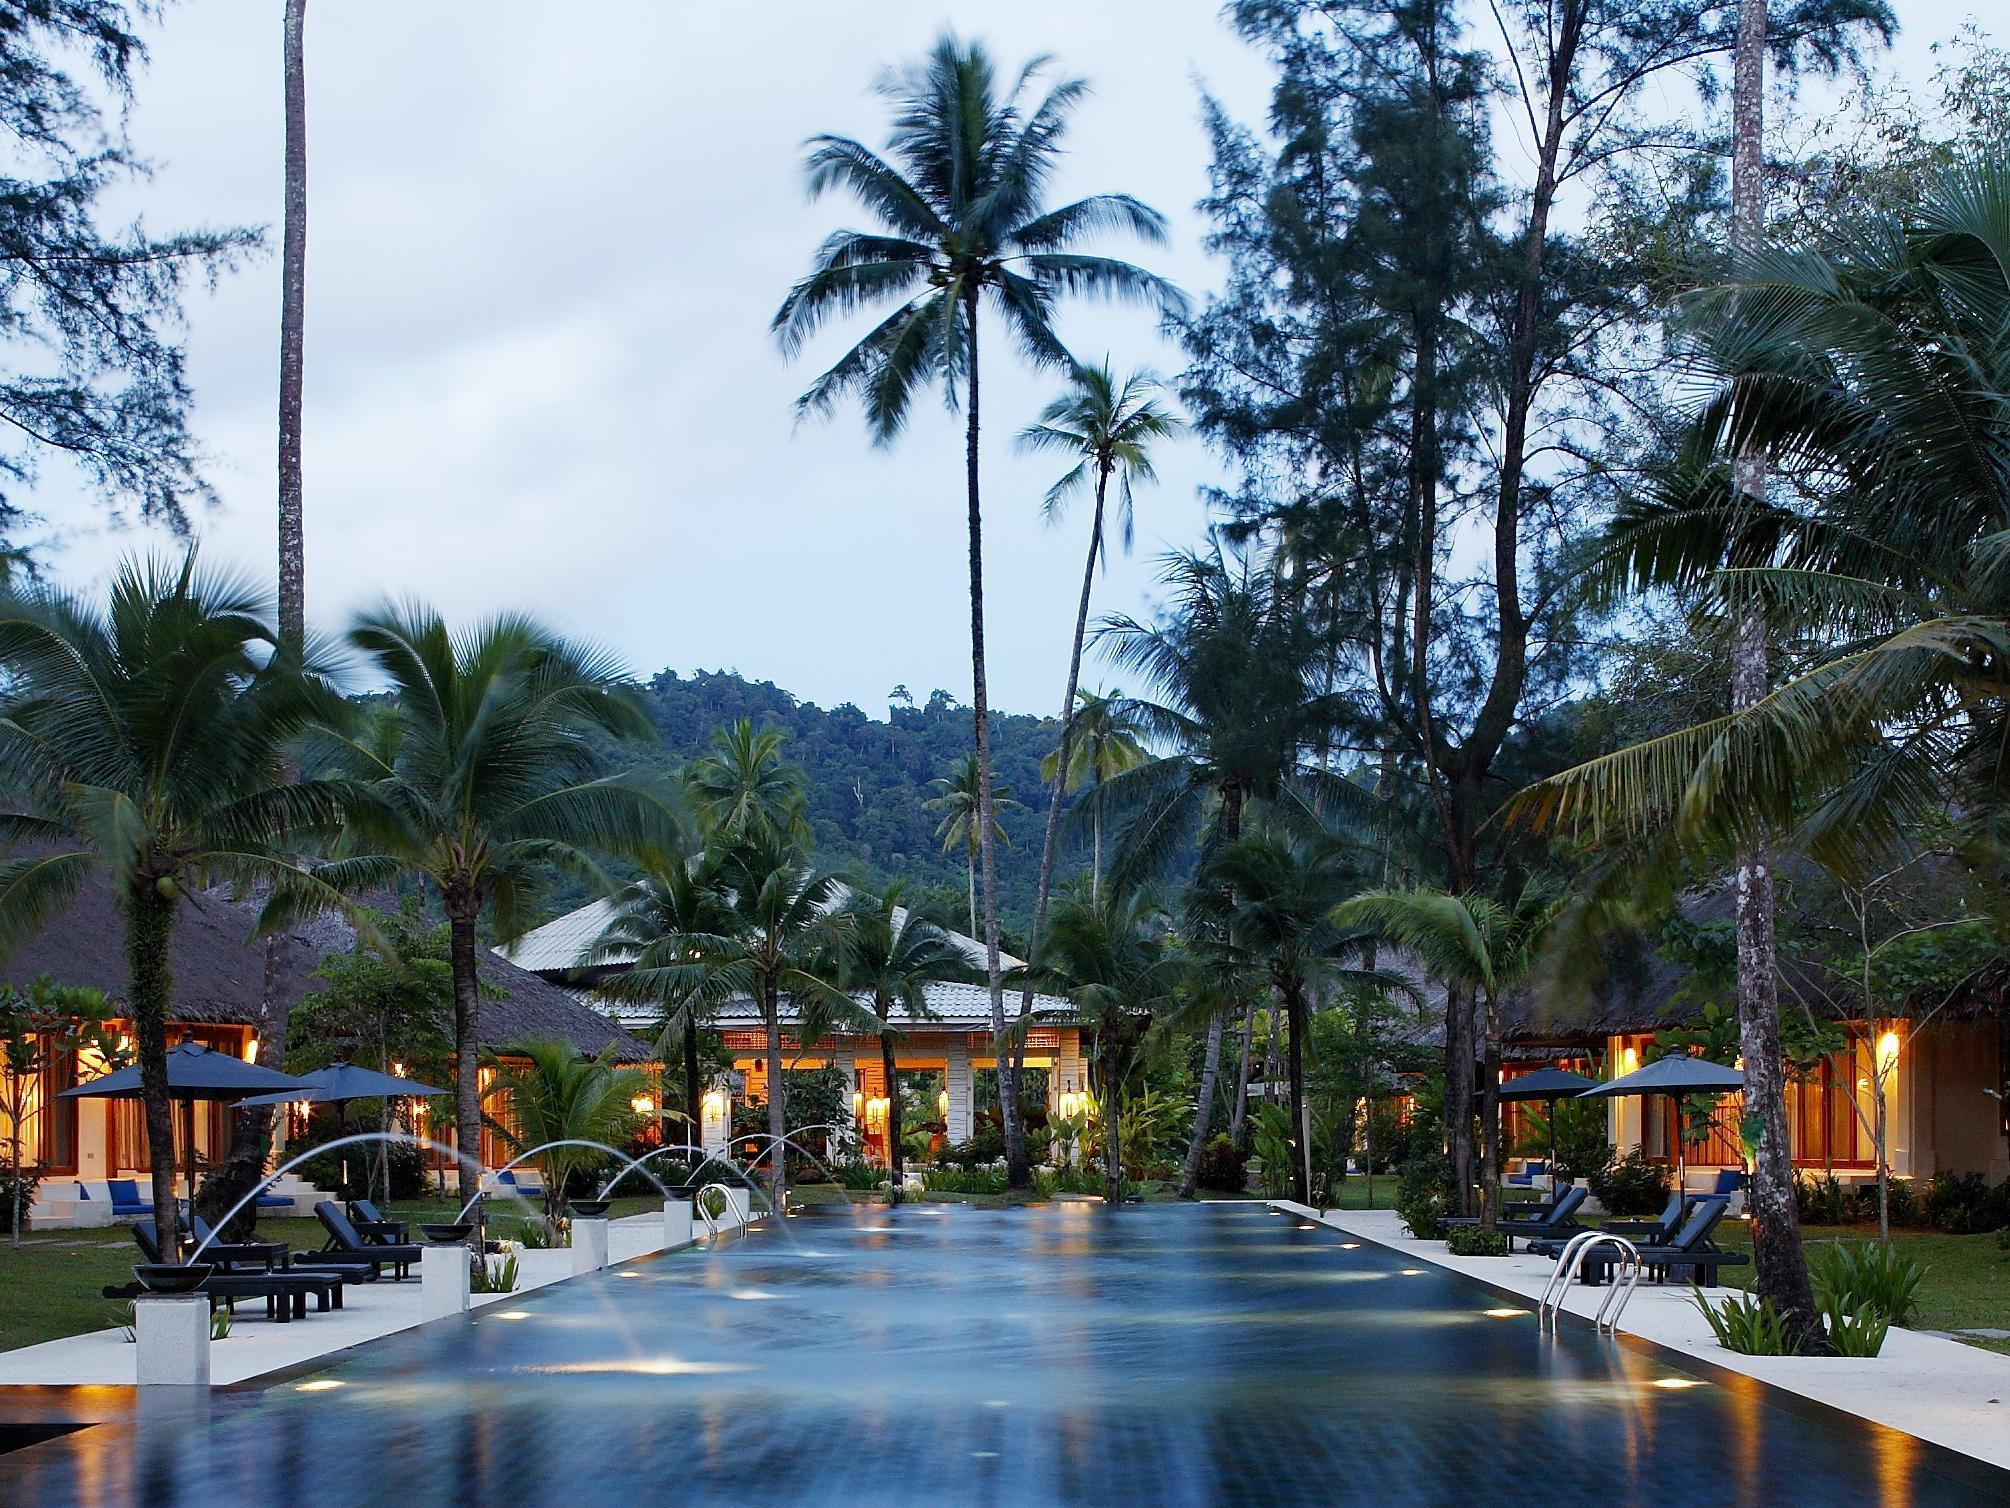 Bangsak Village Resort Adults Only